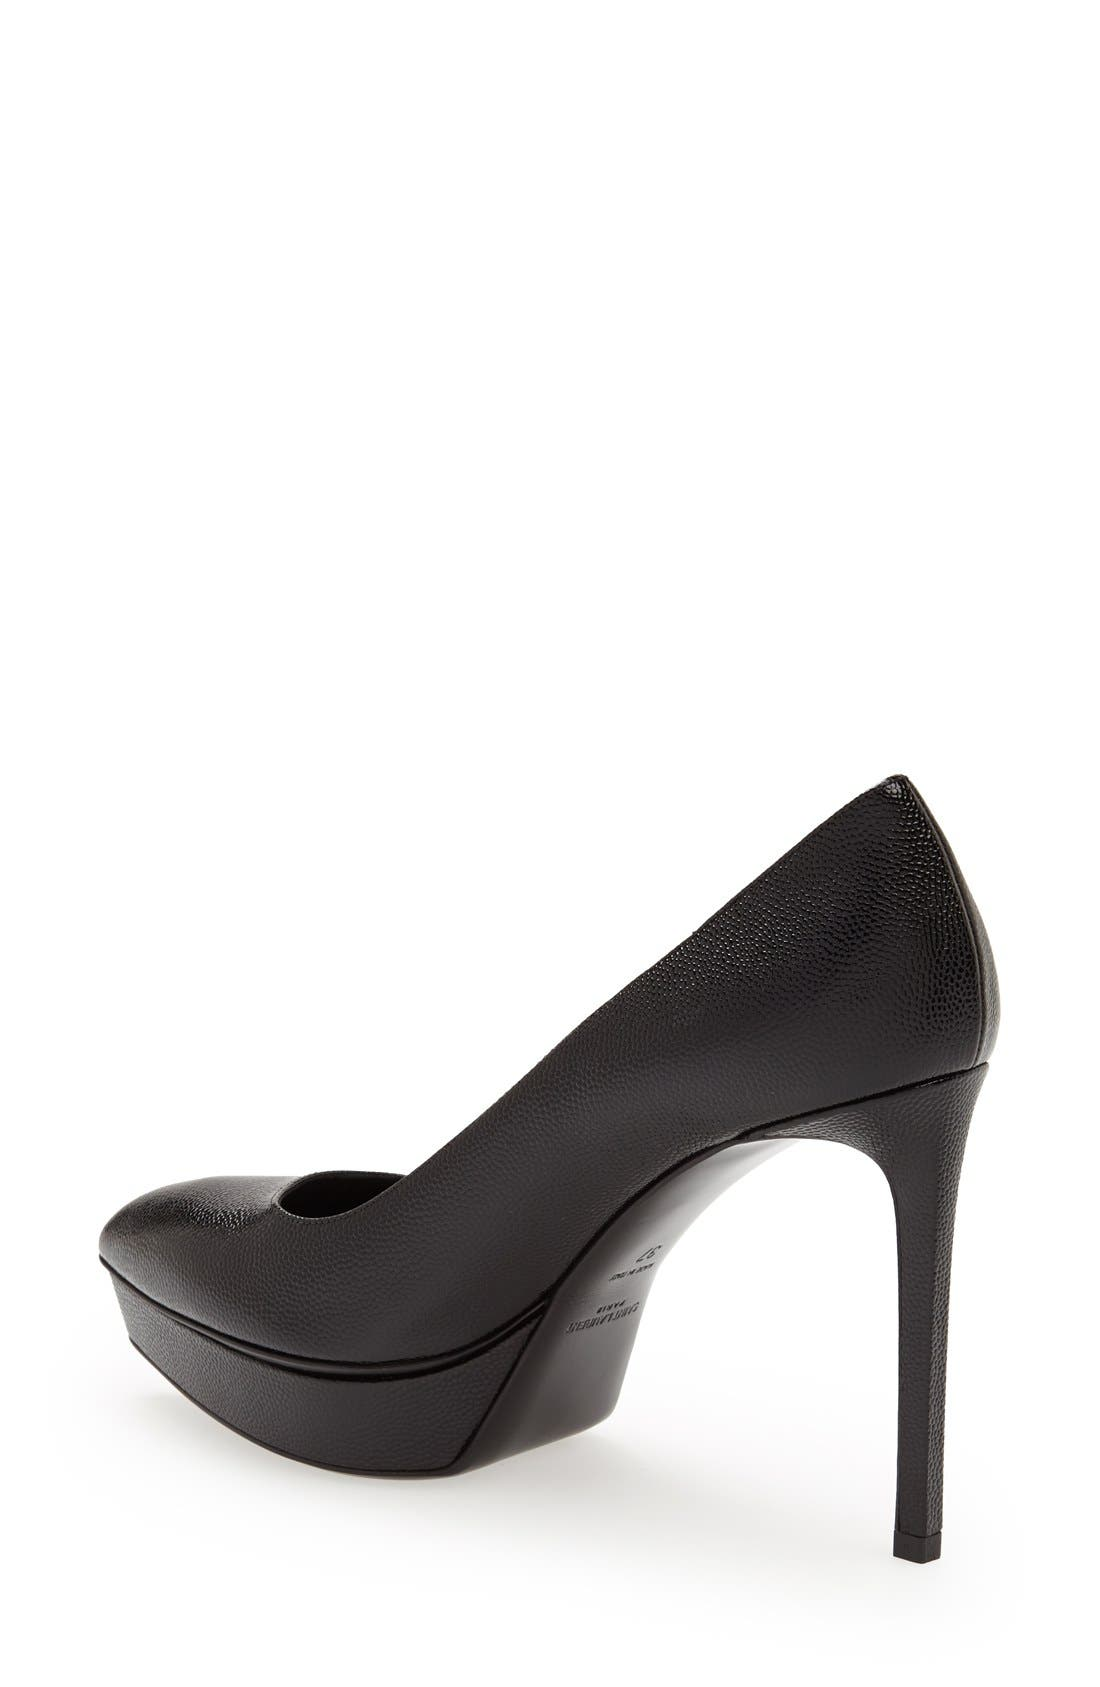 'Janis' Pointy Toe Platform Pump,                             Alternate thumbnail 2, color,                             Black